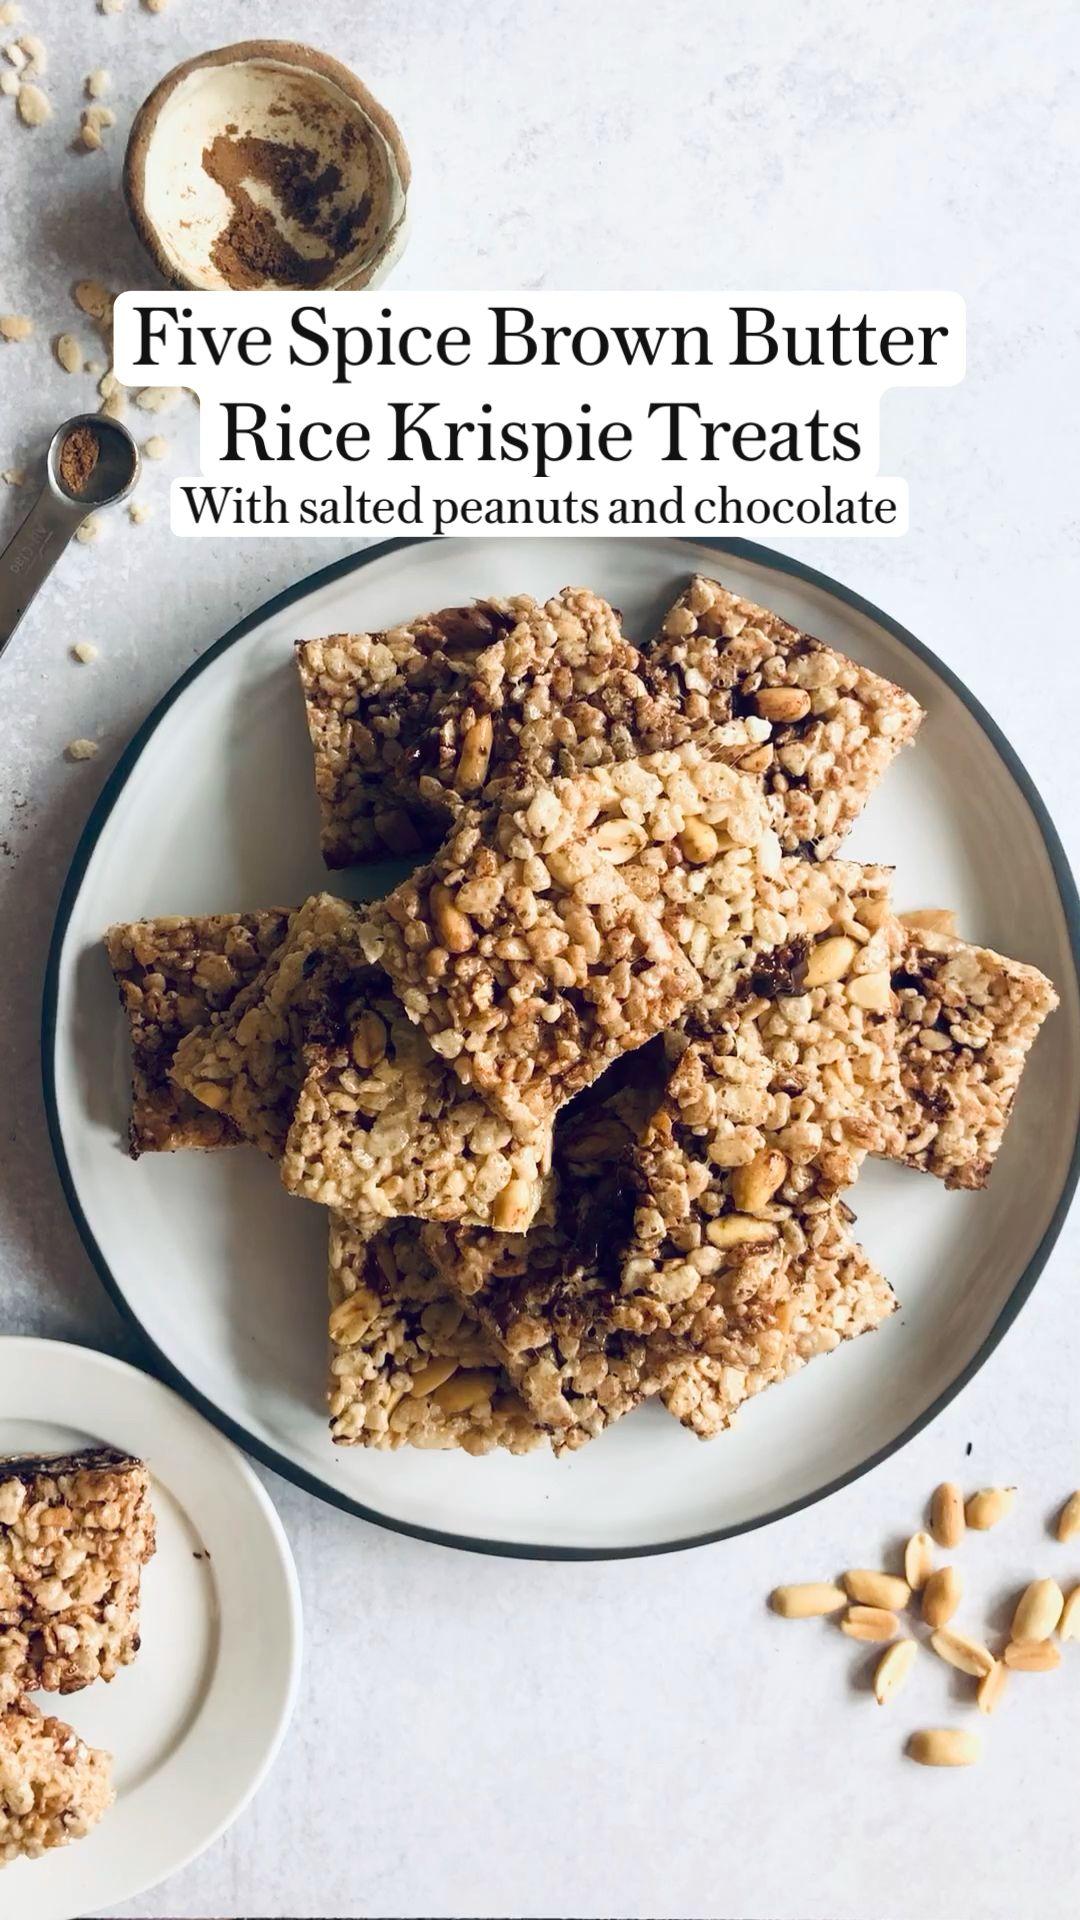 Peter Som's Five Spice Brown Butter Rice Krispie T